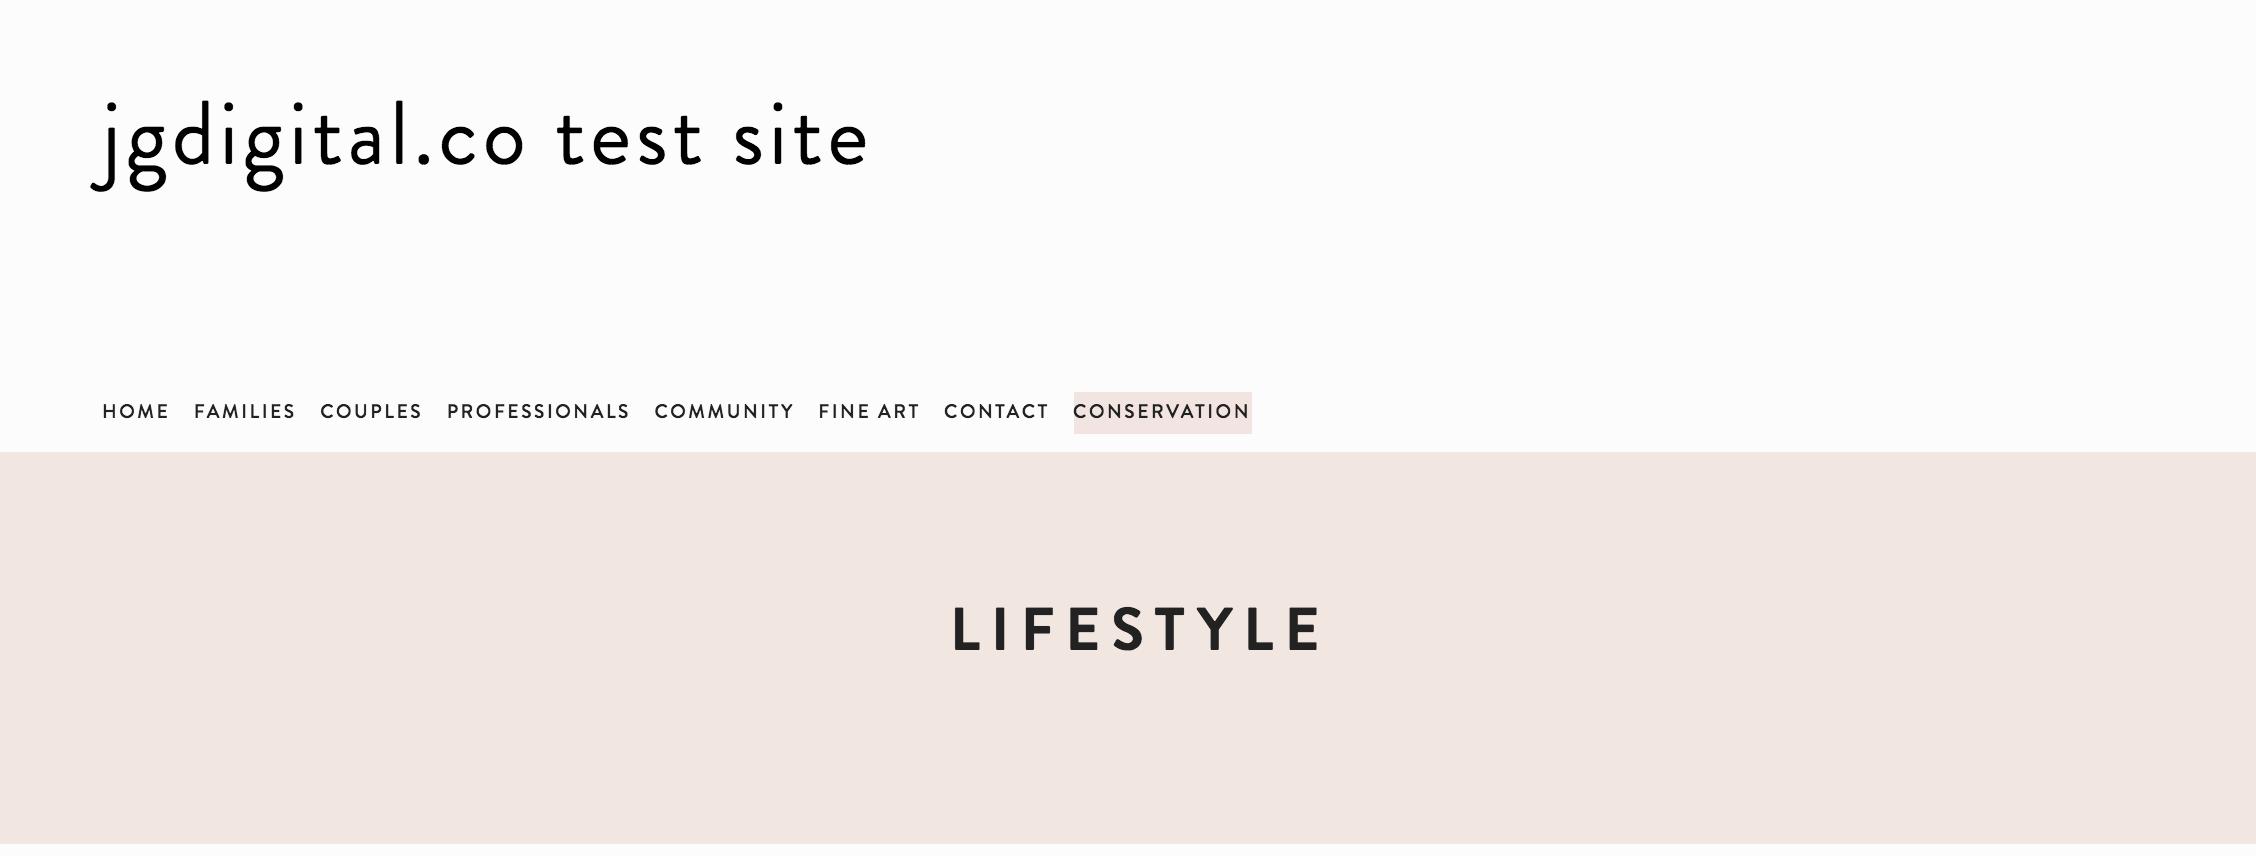 Custom Index Background Color